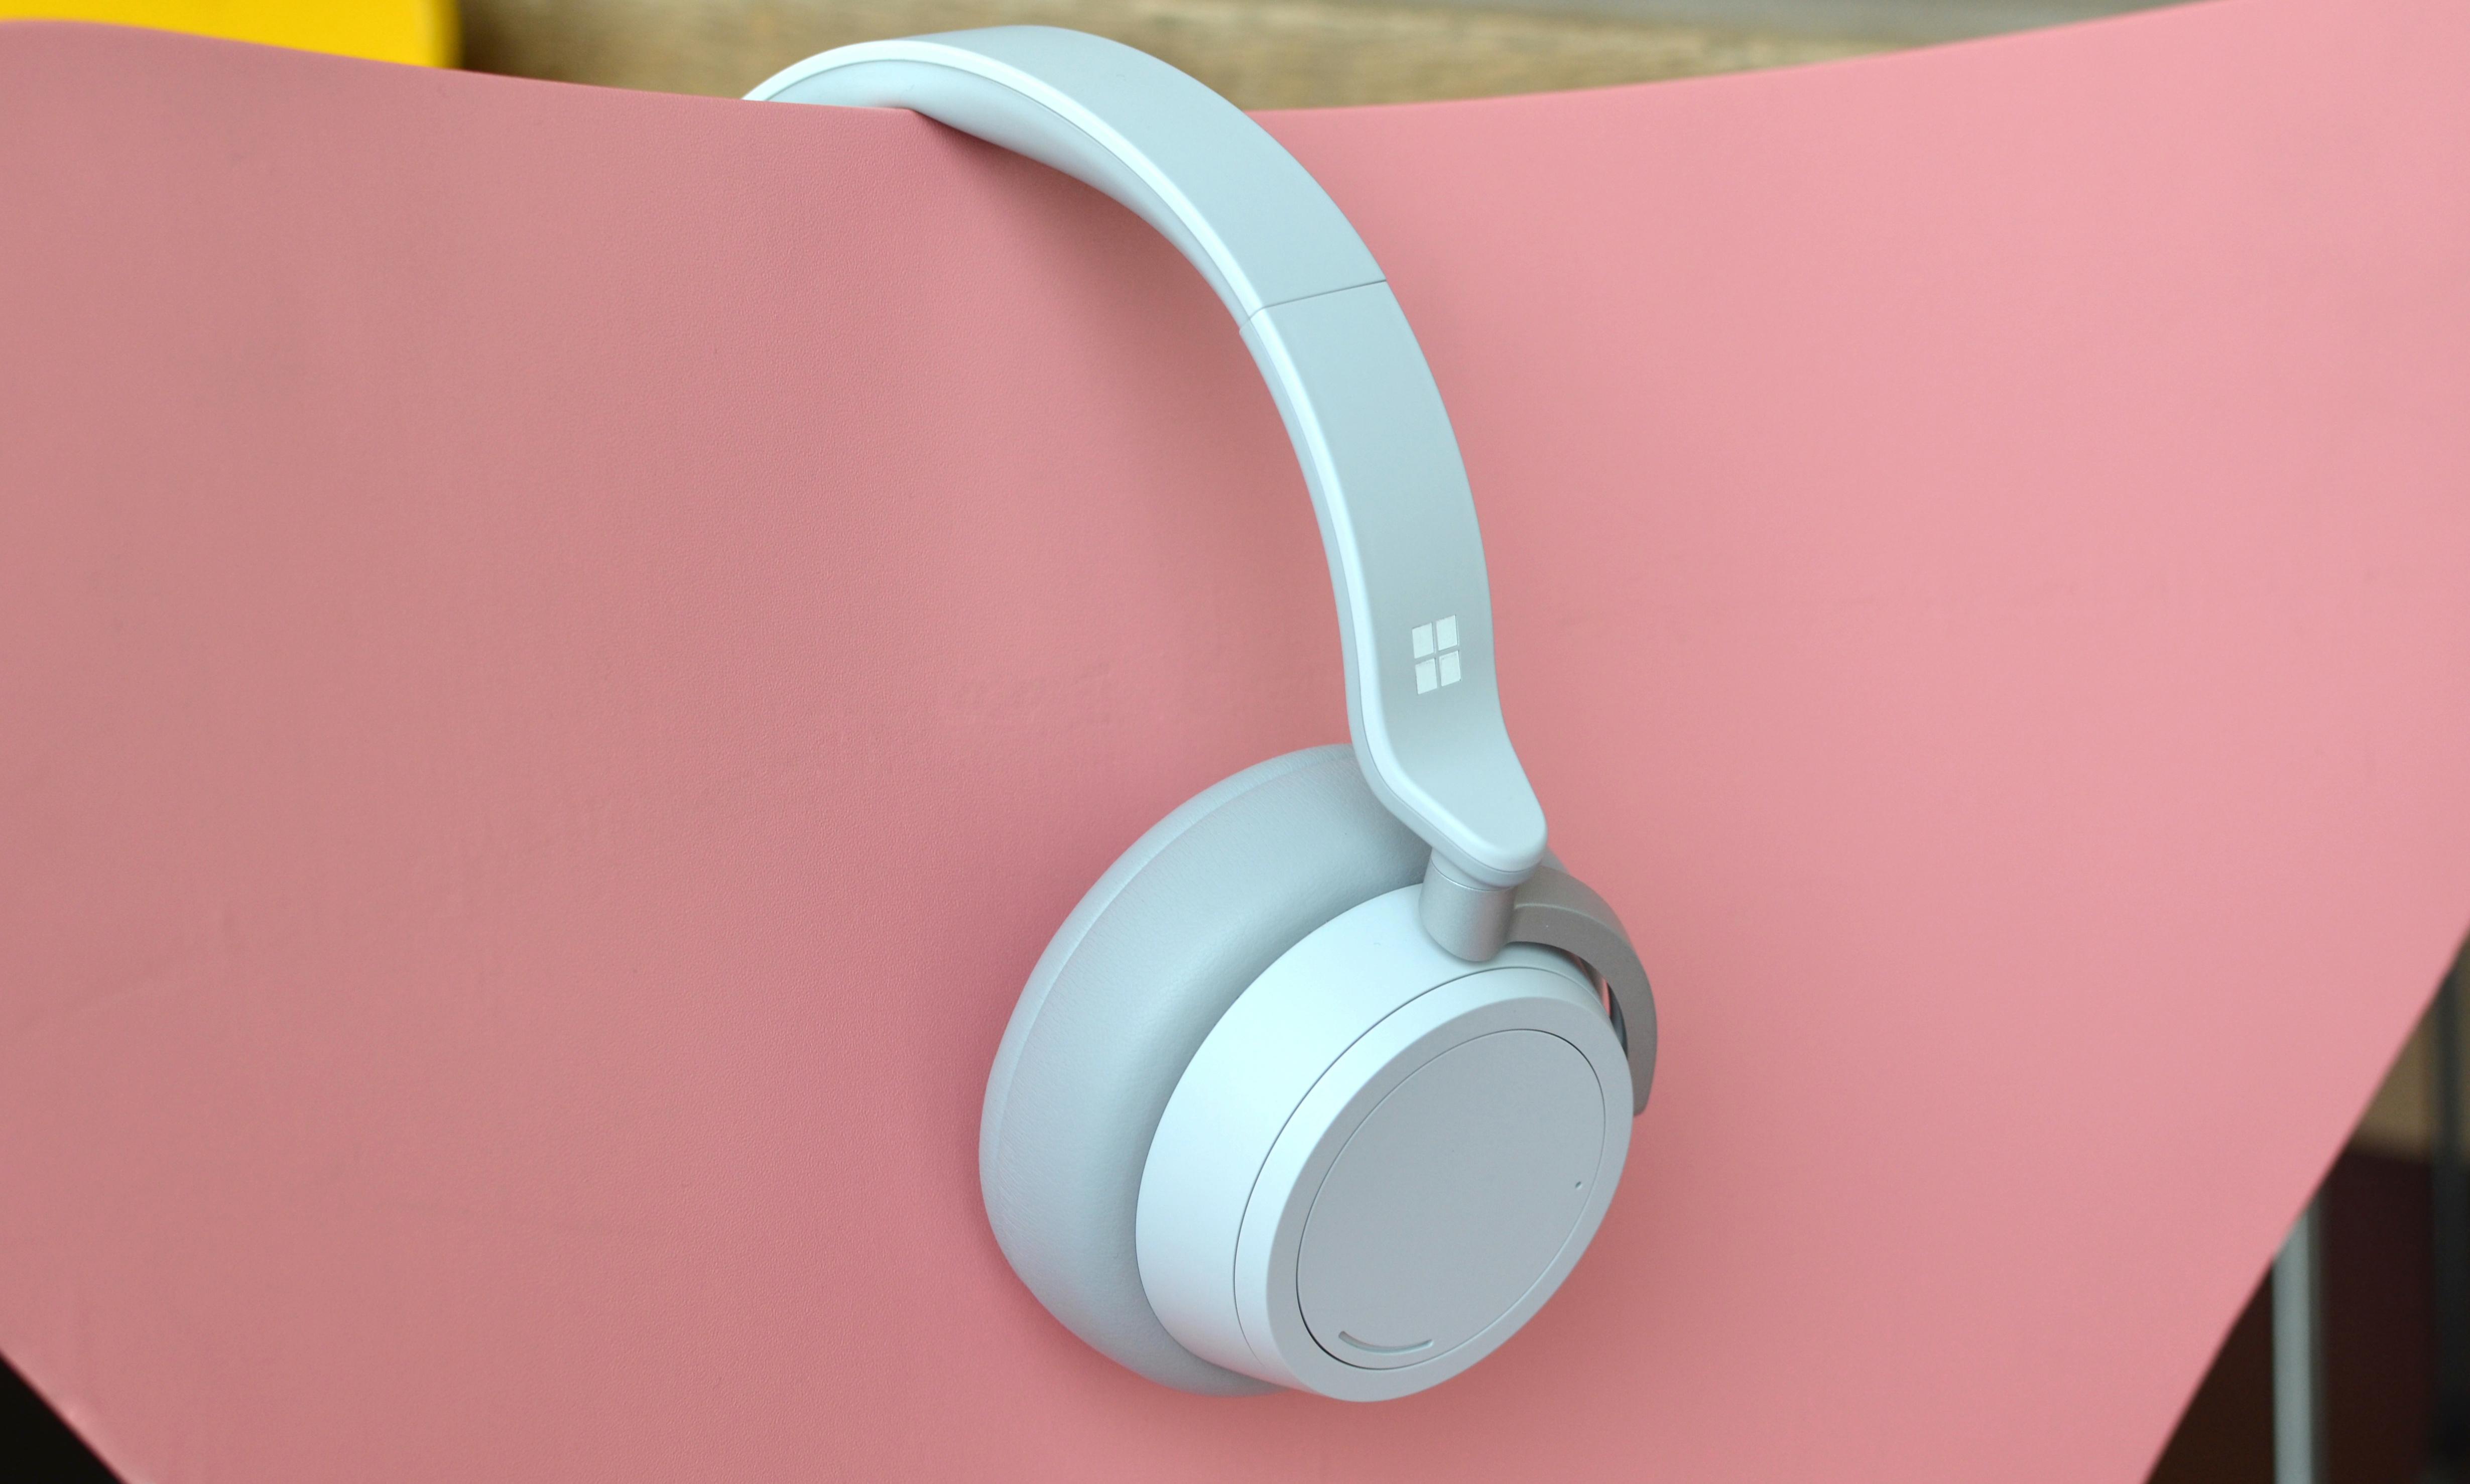 Microsoft Surface Headphones review: close but no cigar